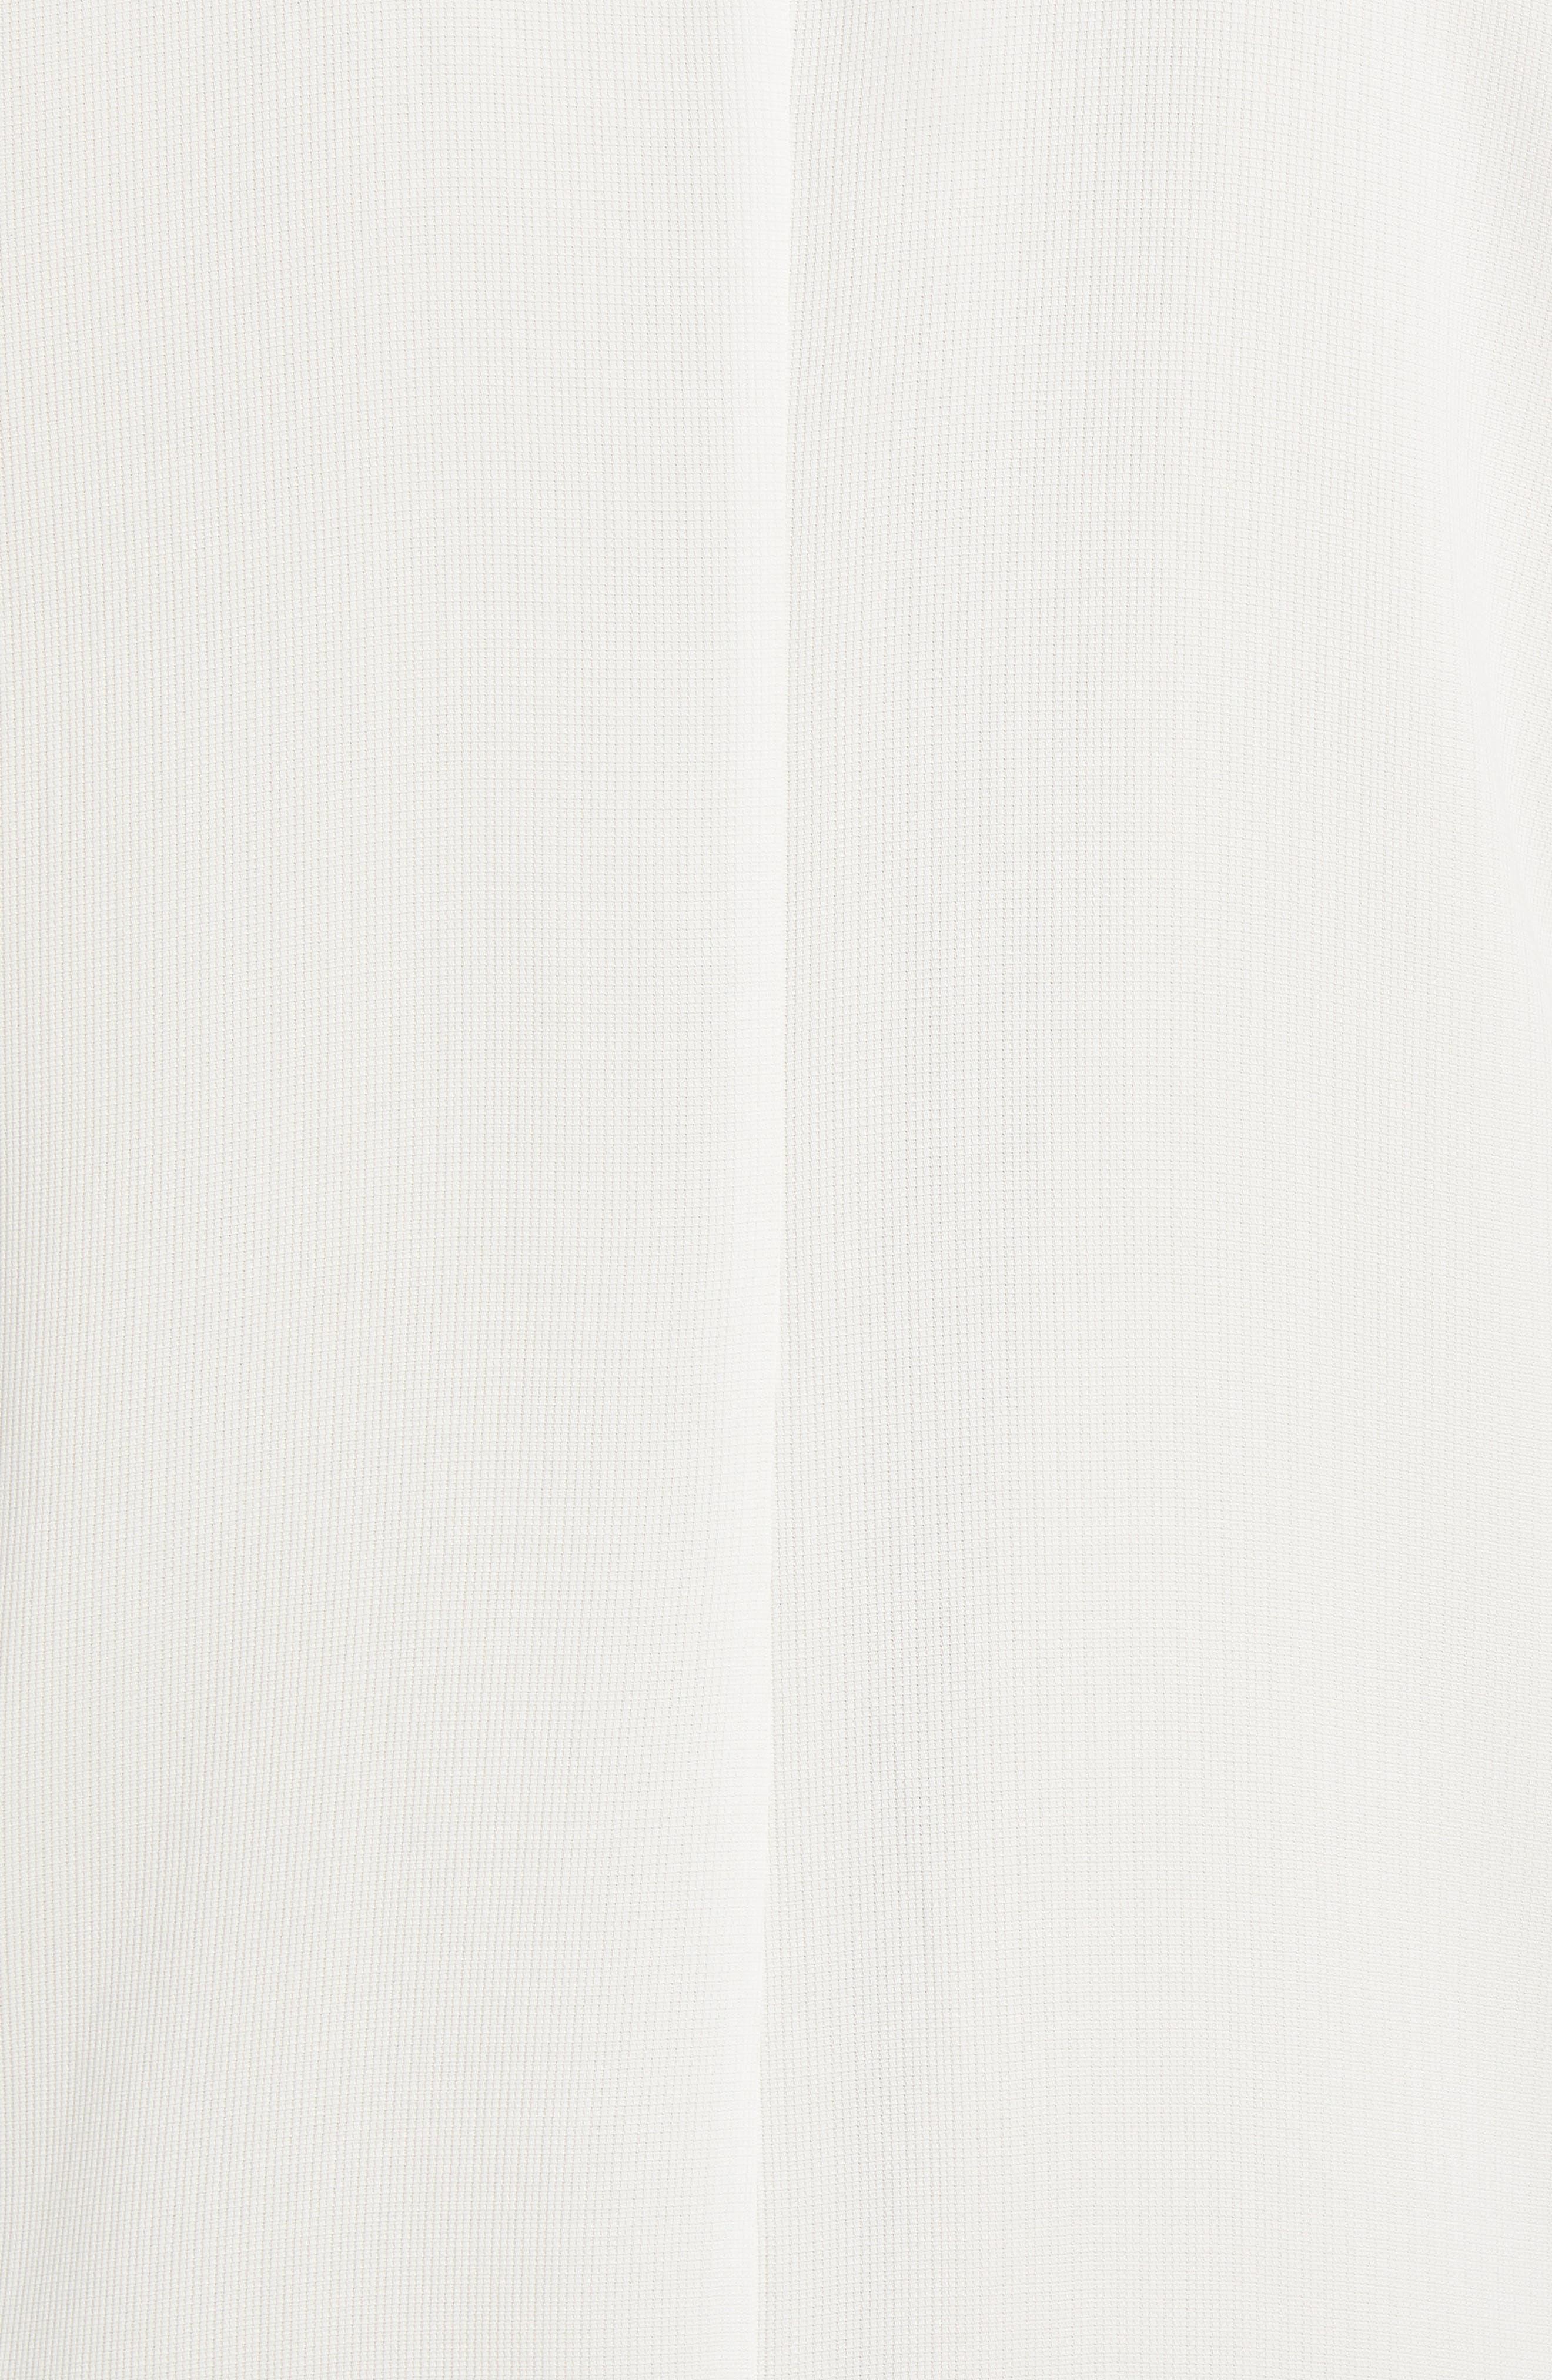 Long Tencel<sup>®</sup> Lyocell Jacket,                             Alternate thumbnail 6, color,                             White